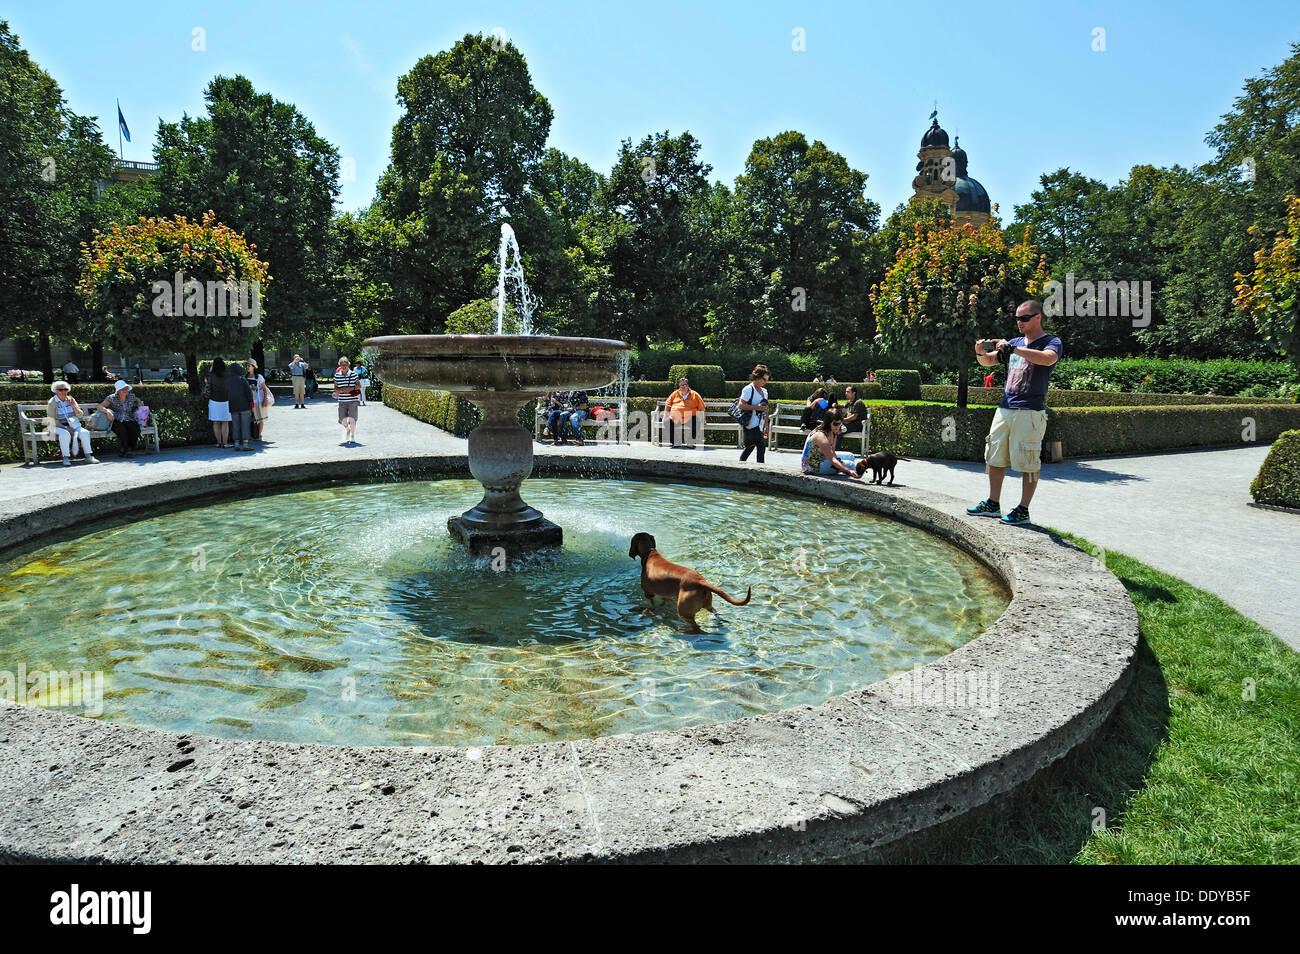 Dog In A Fountain, Hofgarten, Munich, Bavaria